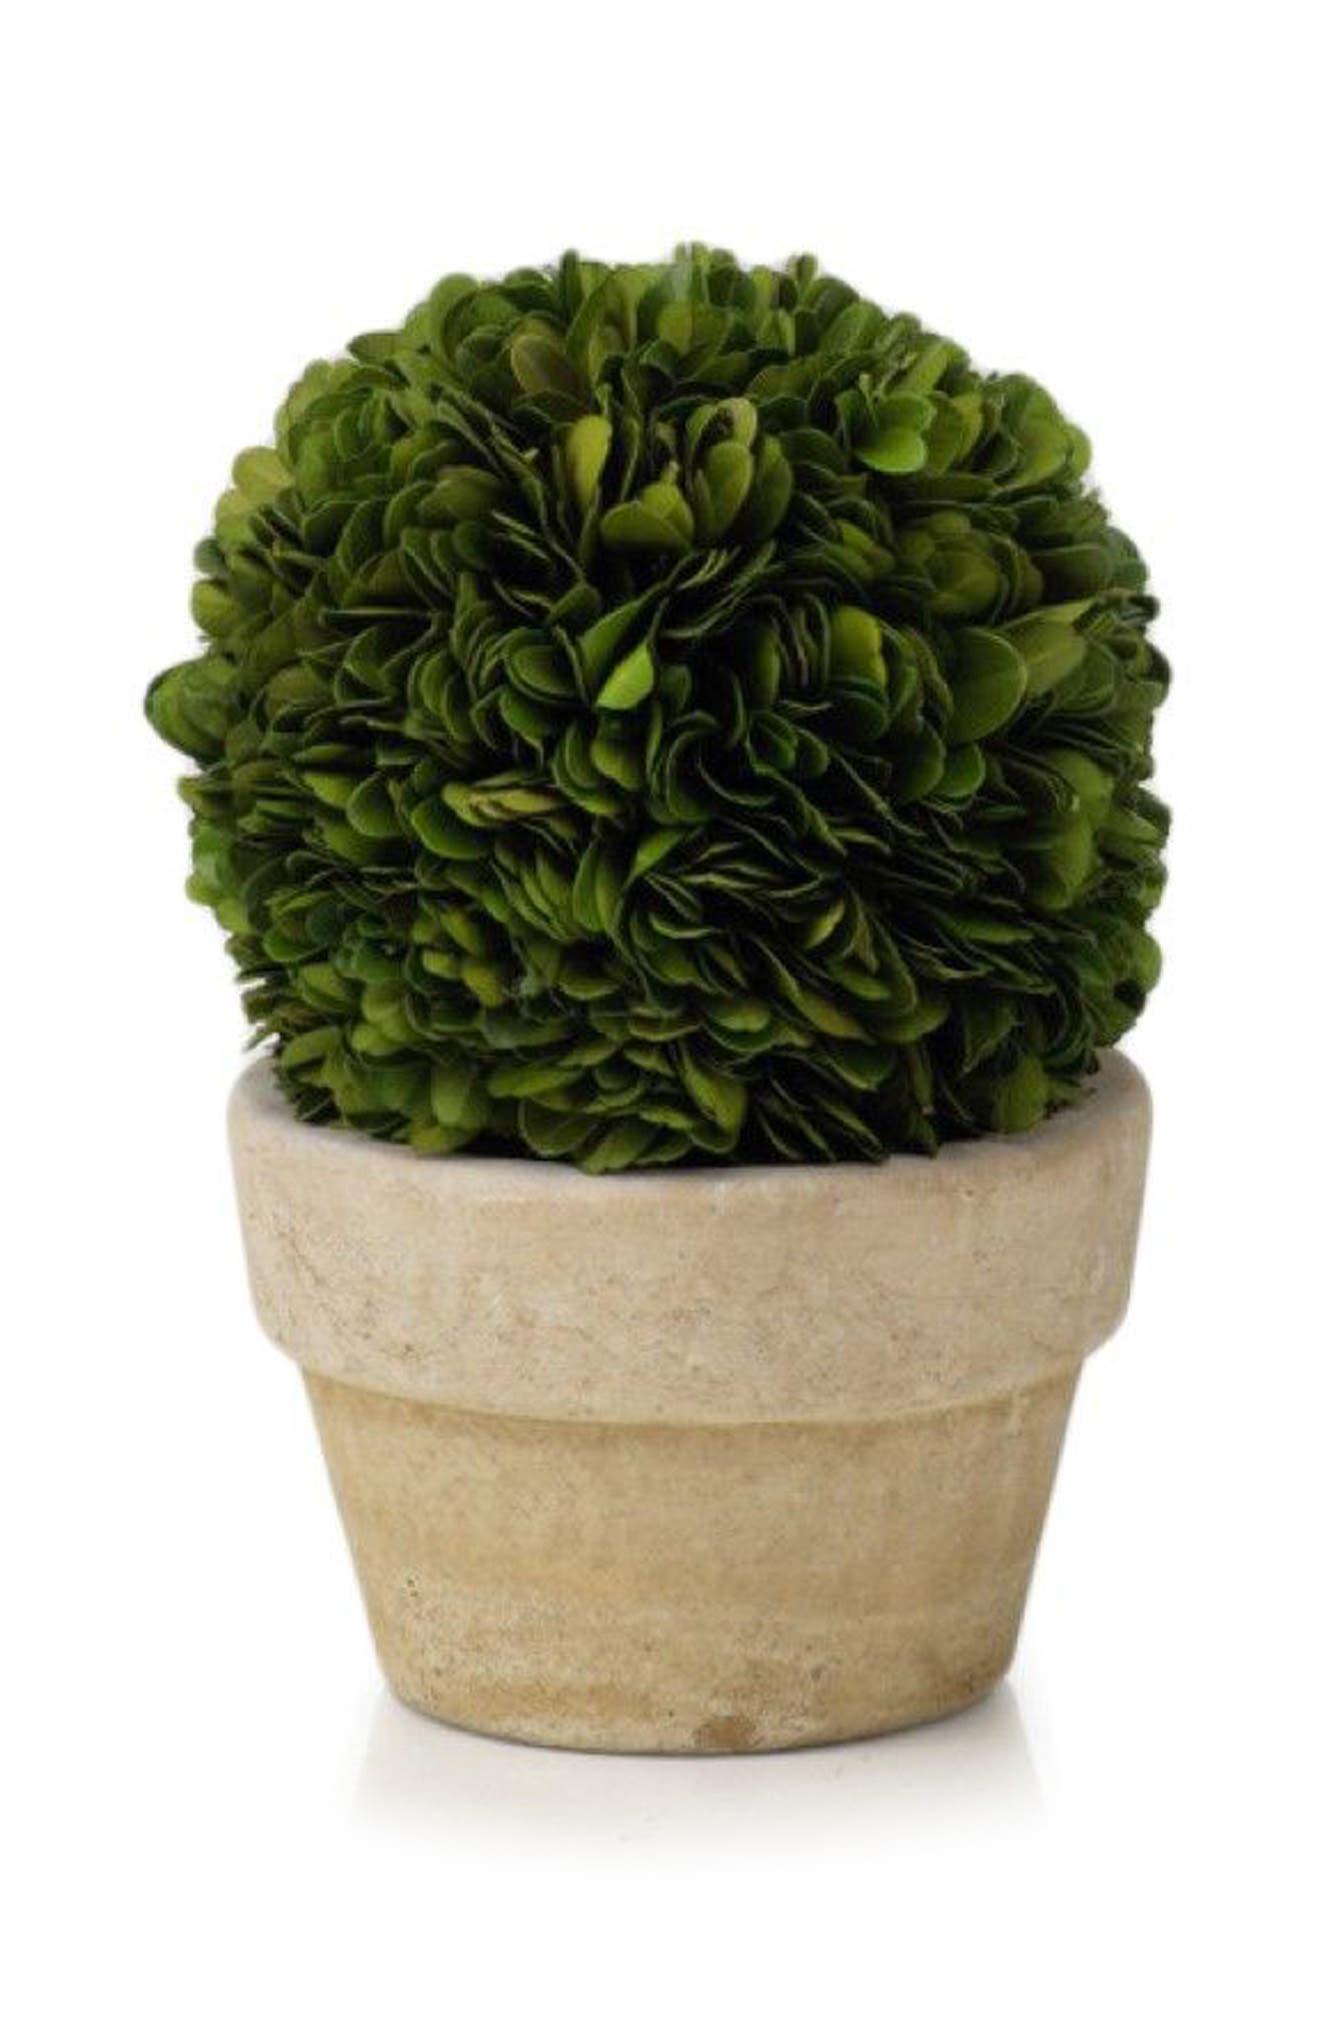 Boxwood Topiary Decoration,                             Main thumbnail 1, color,                             Green/ Gray